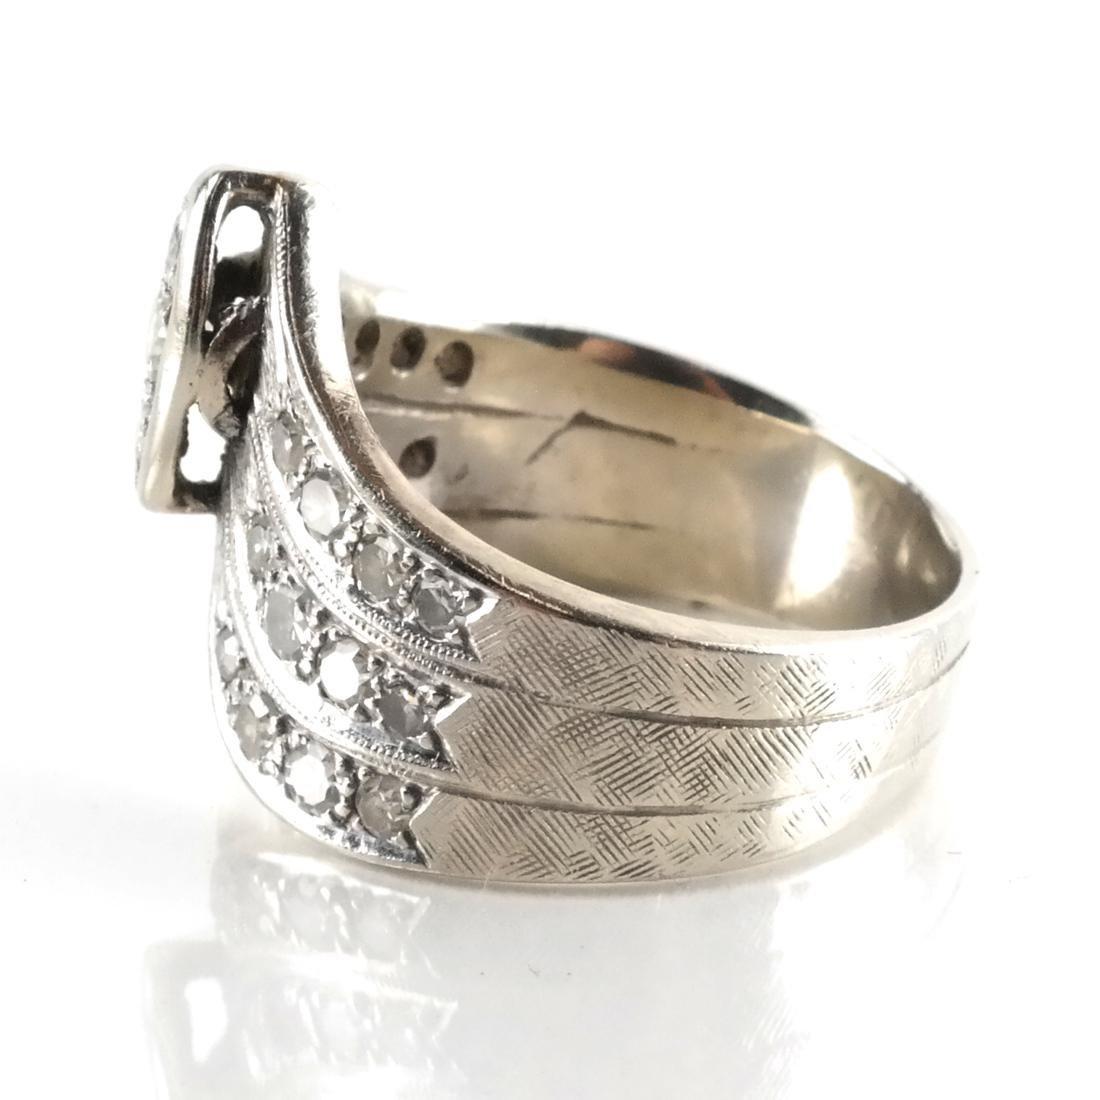 14k WG & Diamond Cocktail Ring - 2